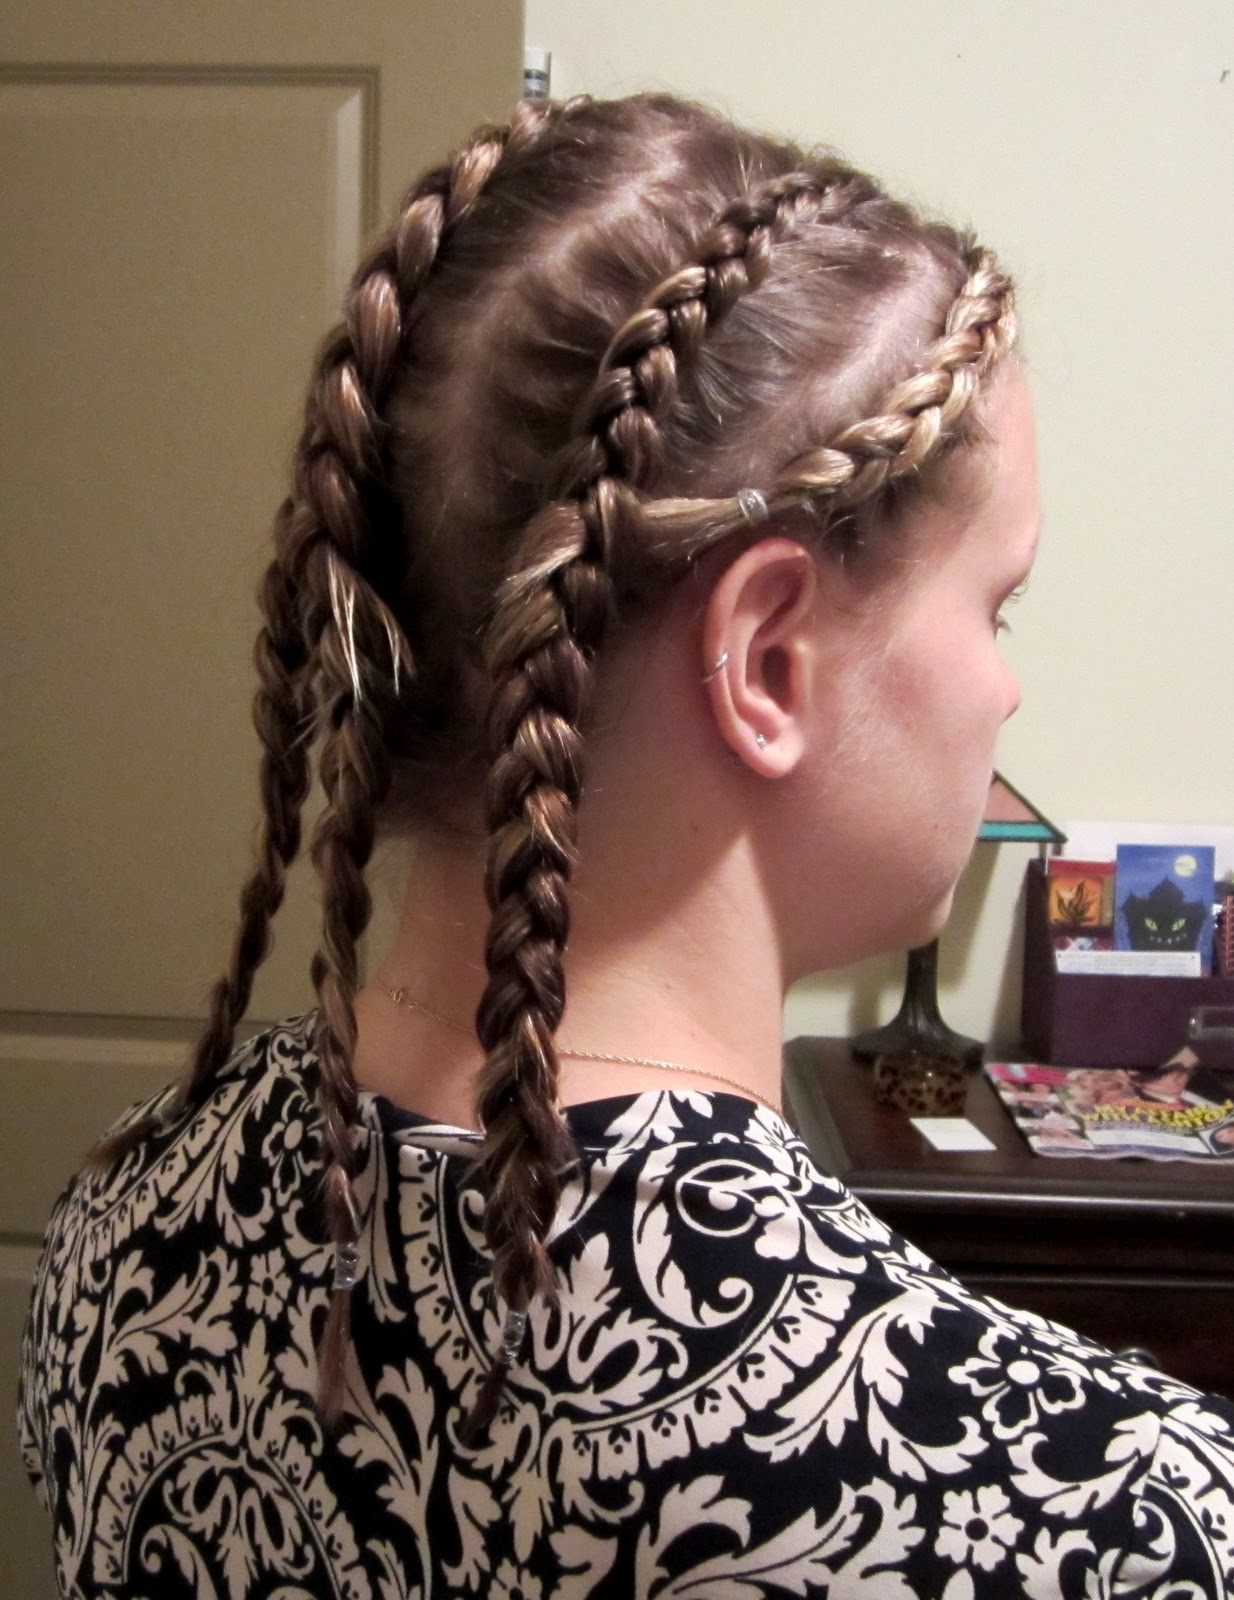 bye bye beehive │ a hairstyle blog: headband braid.